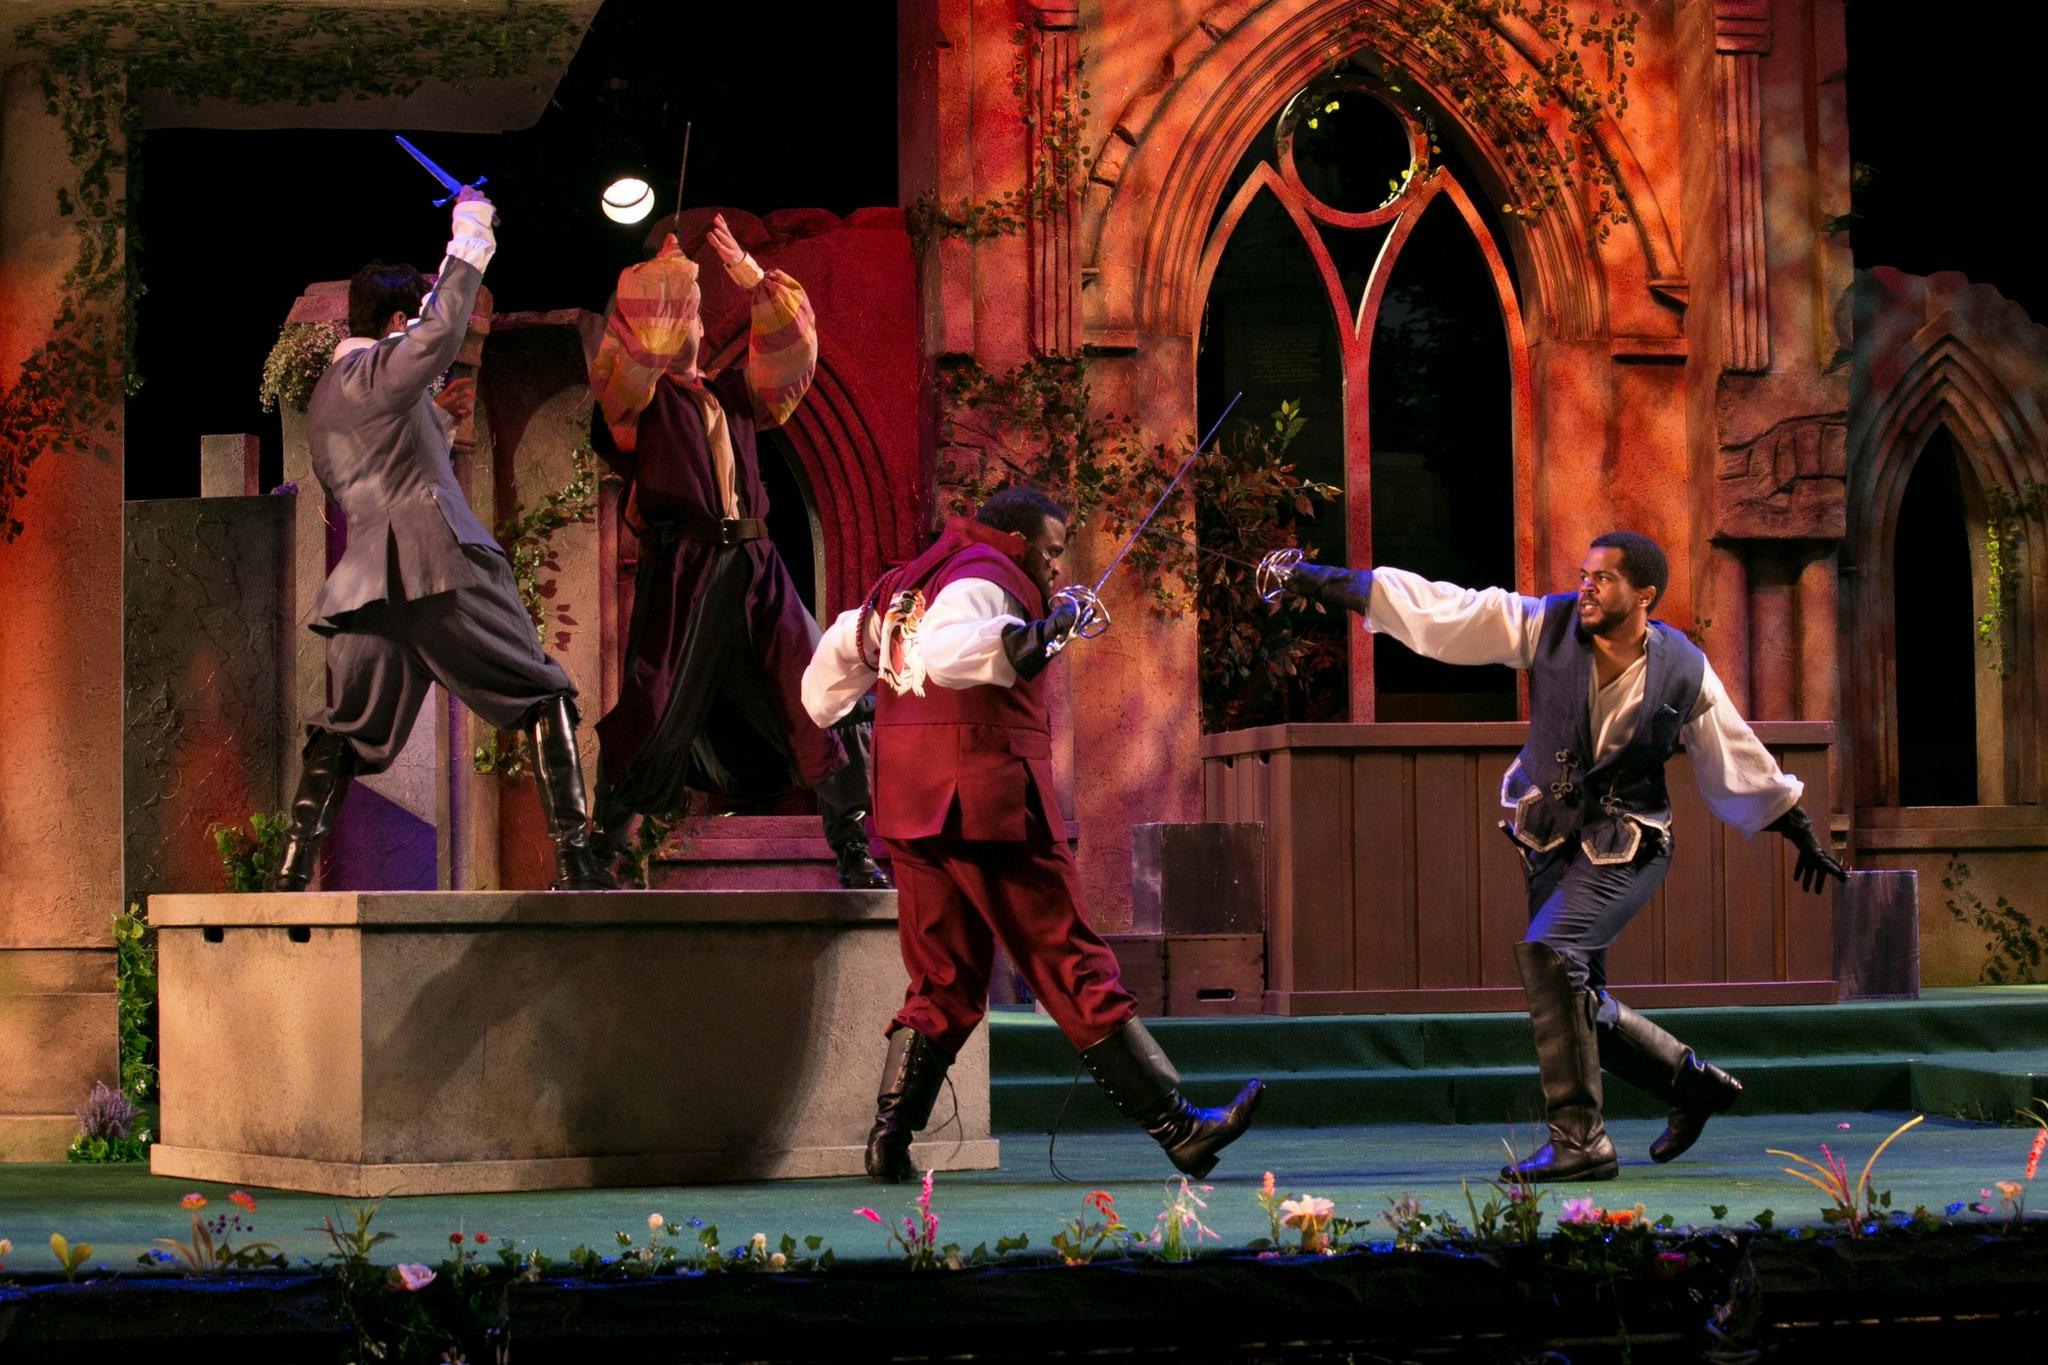 Kai Tshikosi (Tybalt) and Brandon G. Green (Benvolio) in Romeo & Juliet, Shakespeare on the Common 2017-Photo by Evgenia Eliseeva